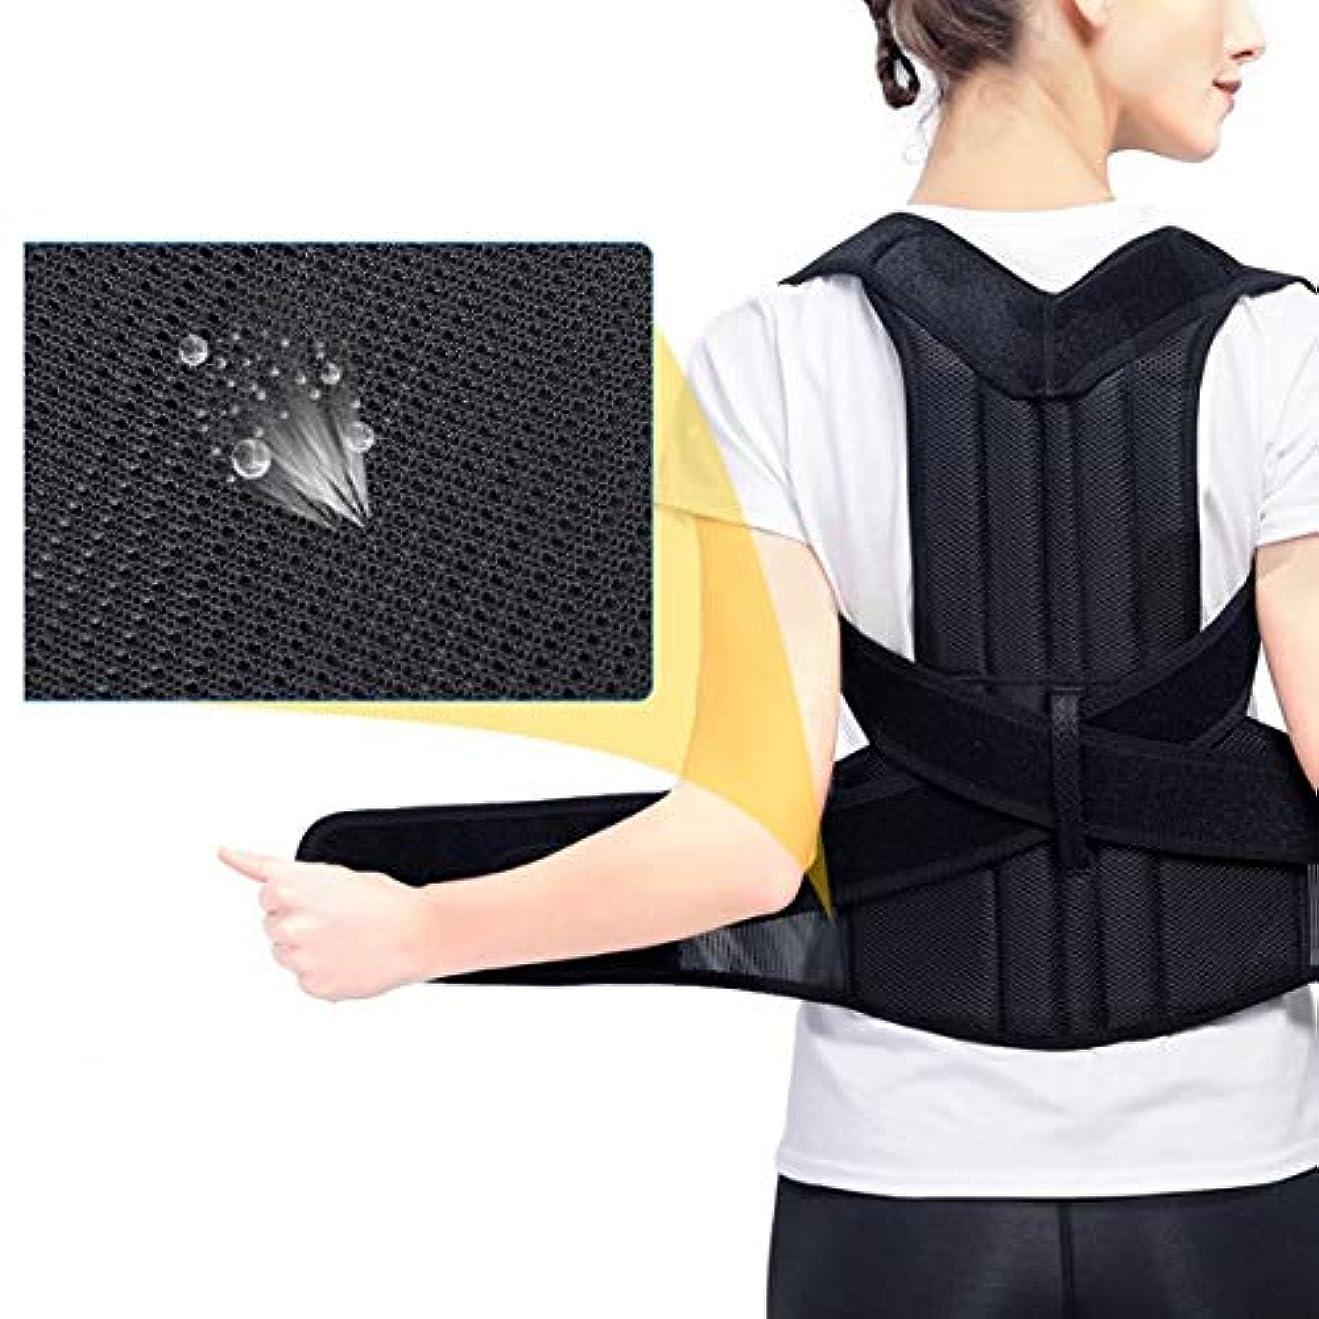 補助永遠の人柄腰椎矯正バックブレース背骨装具側弯症腰椎サポート脊椎湾曲装具固定用姿勢 - 黒